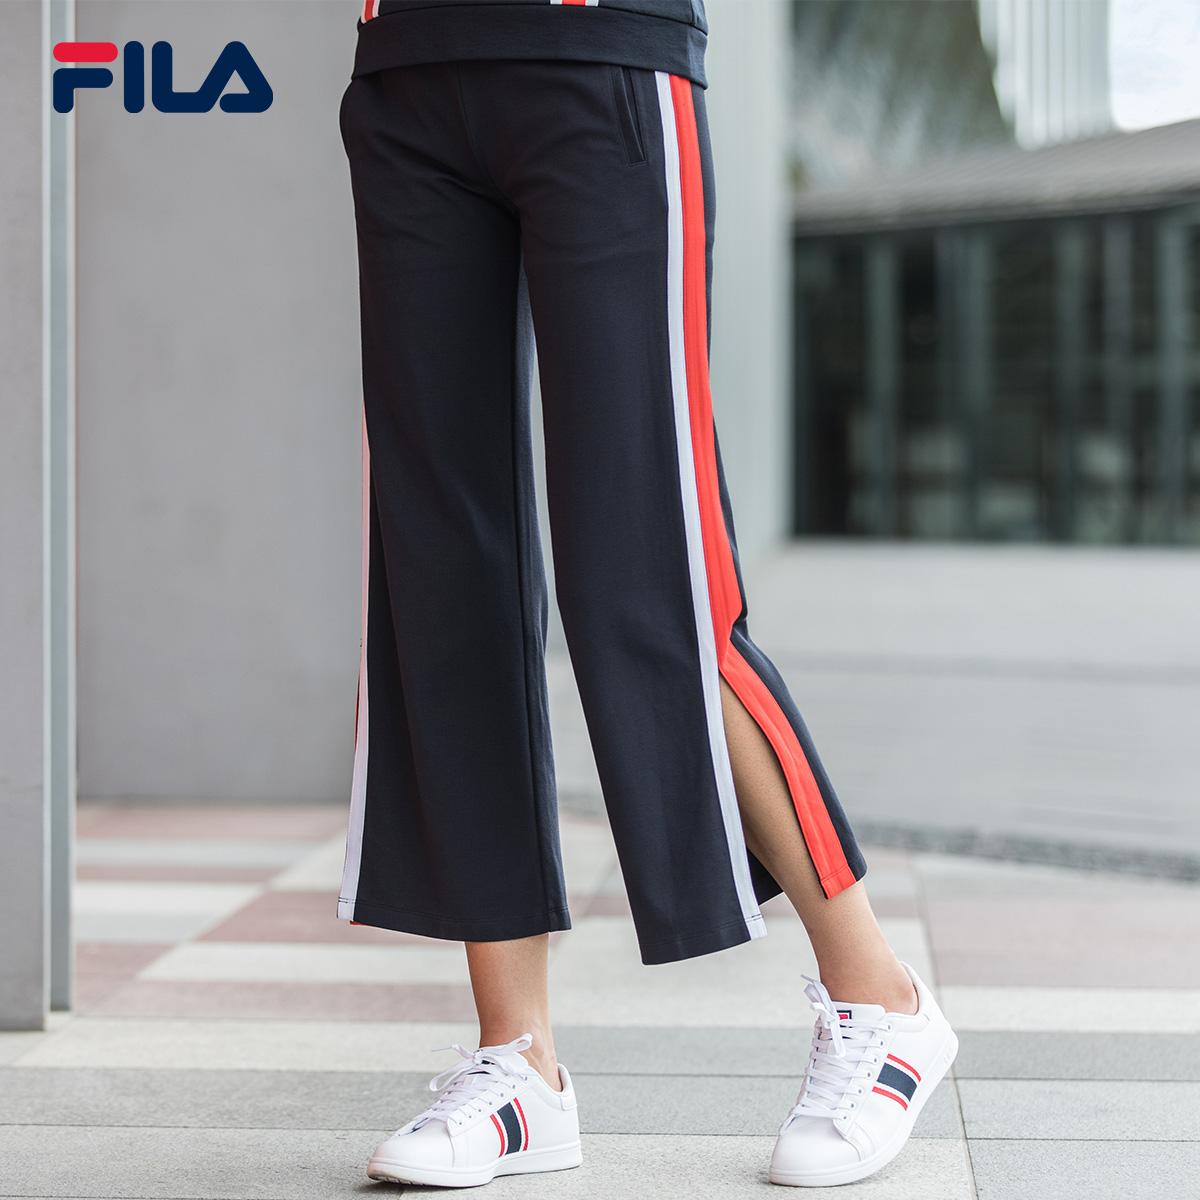 FILA斐乐女裤2018官方正品运动长裤女条纹舒适开叉阔腿裤女